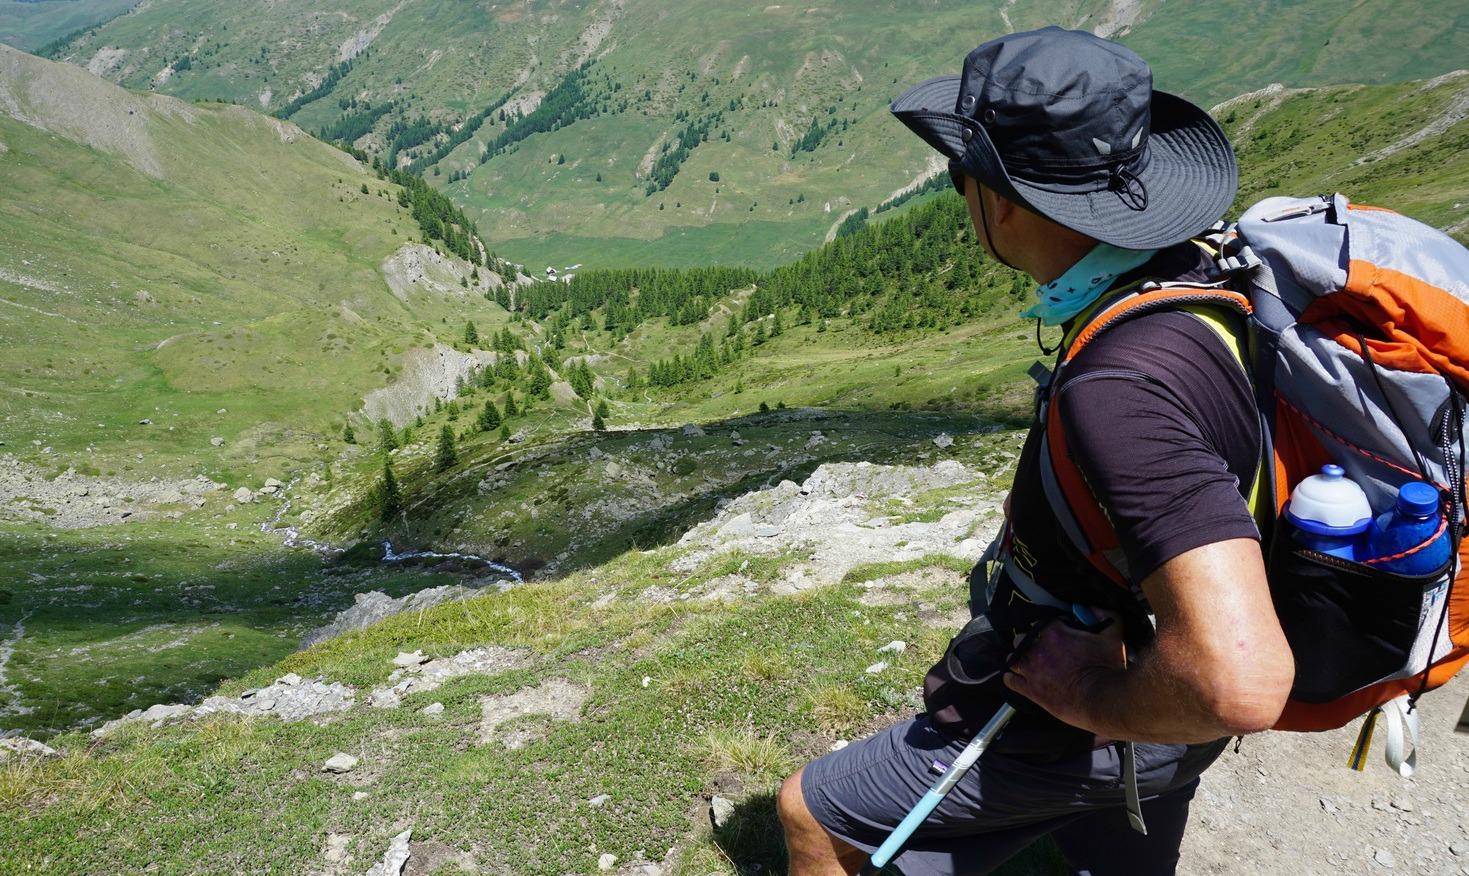 Start of descent to Cerveyrettes Valley